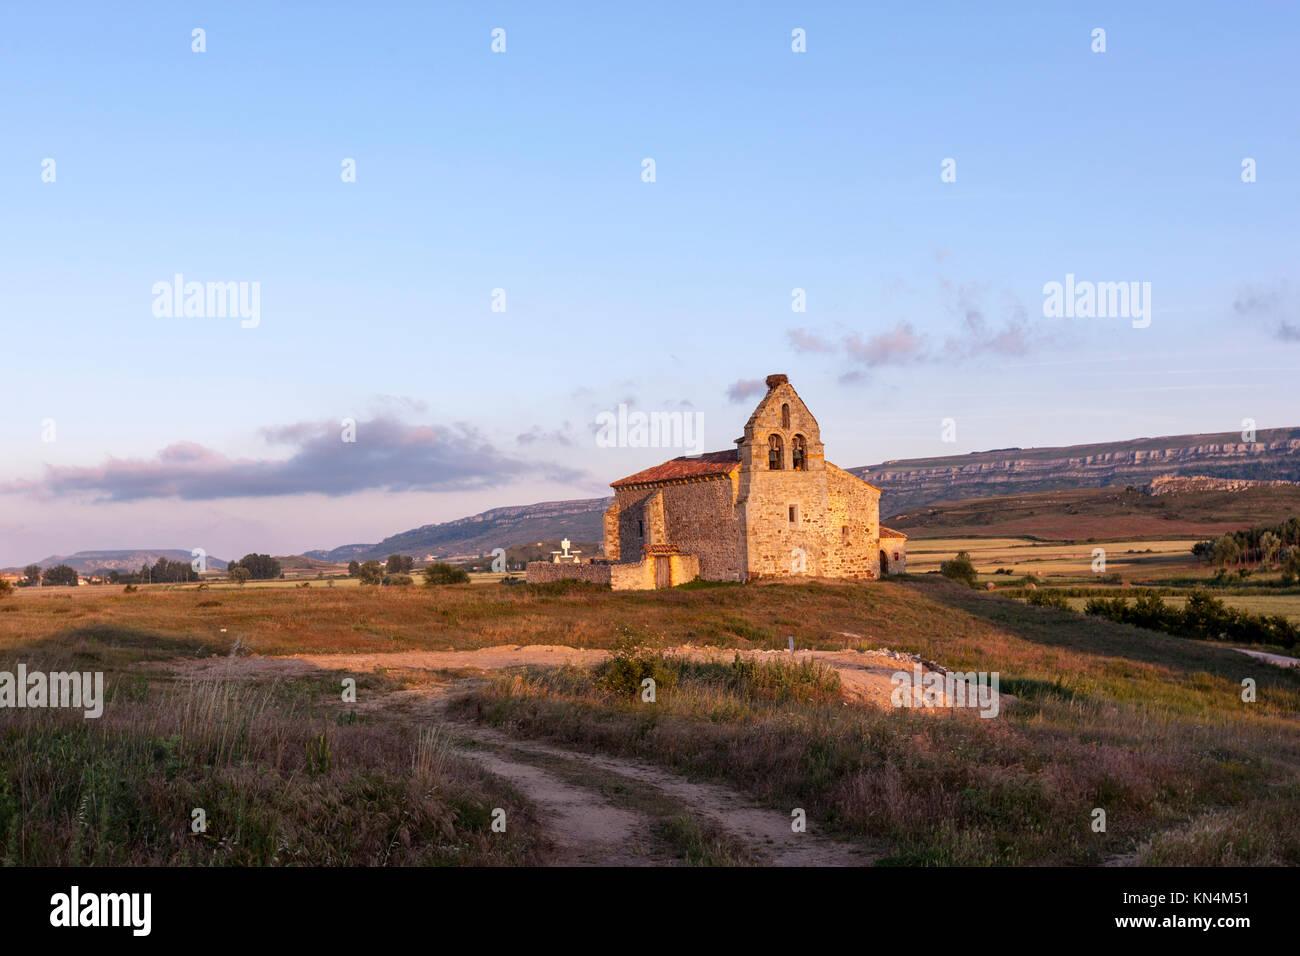 Iglesia de Santa María, church reformed in gothic times, Puentetoma, Palencia province, Spain - Stock Image